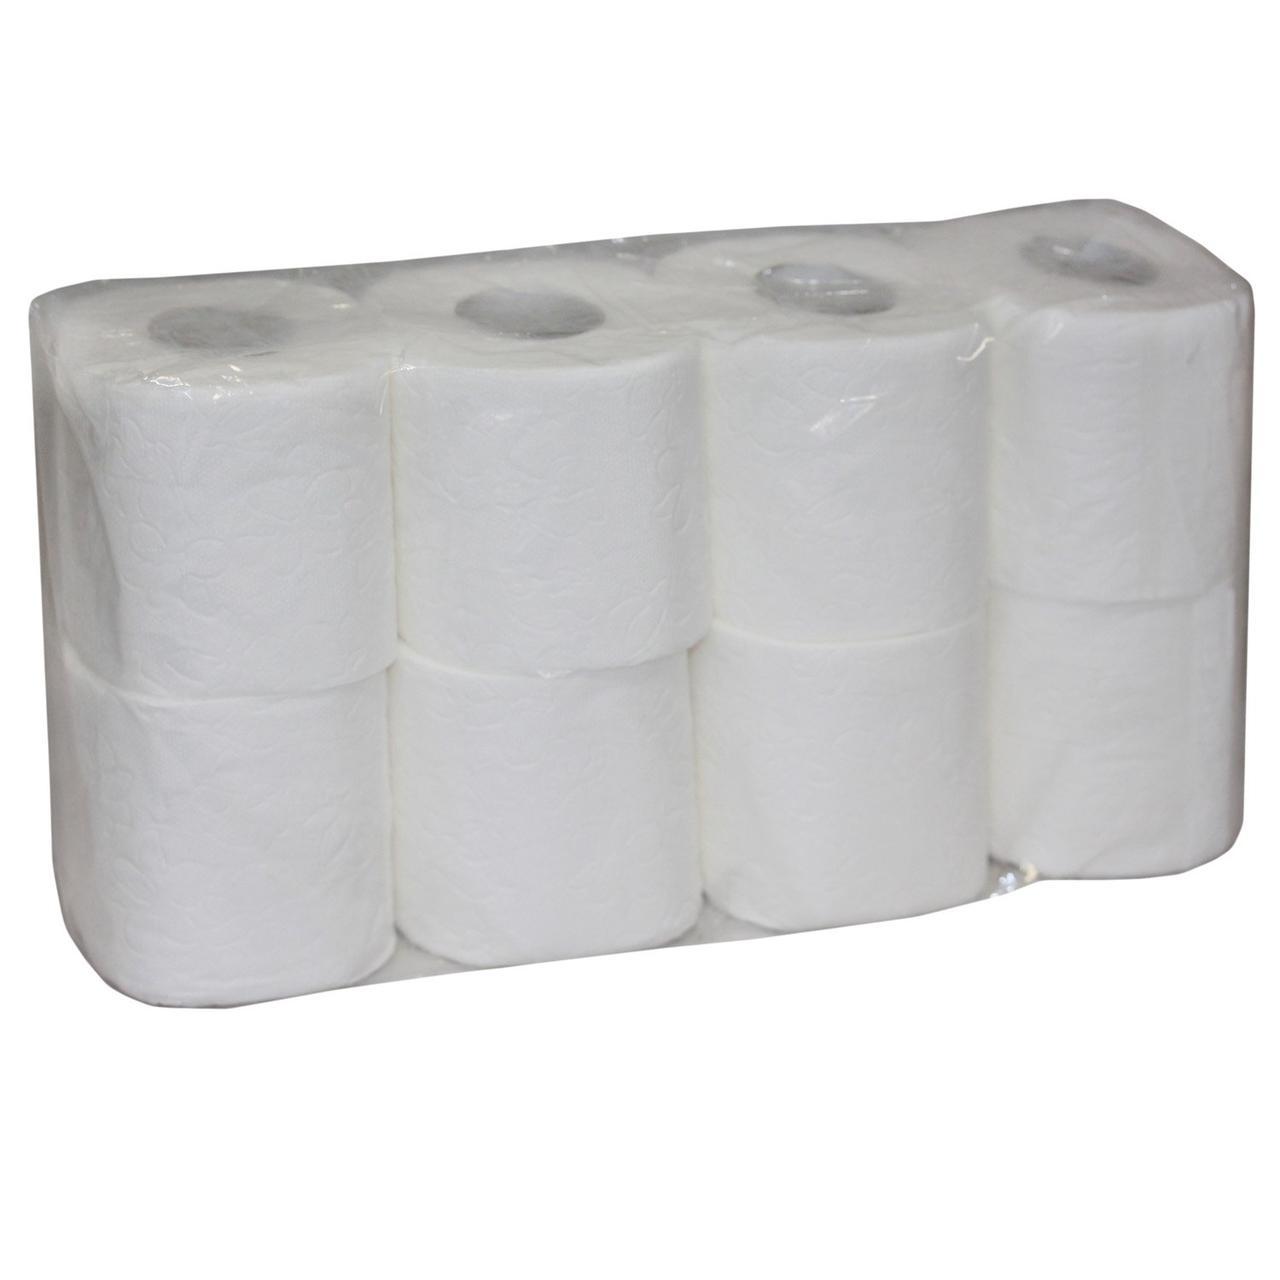 "Бумага туалетная ""Veiro Professional Premium"", 25м, 200лист/рул, 2 сл., бел., целлюлоза, 8 шт"